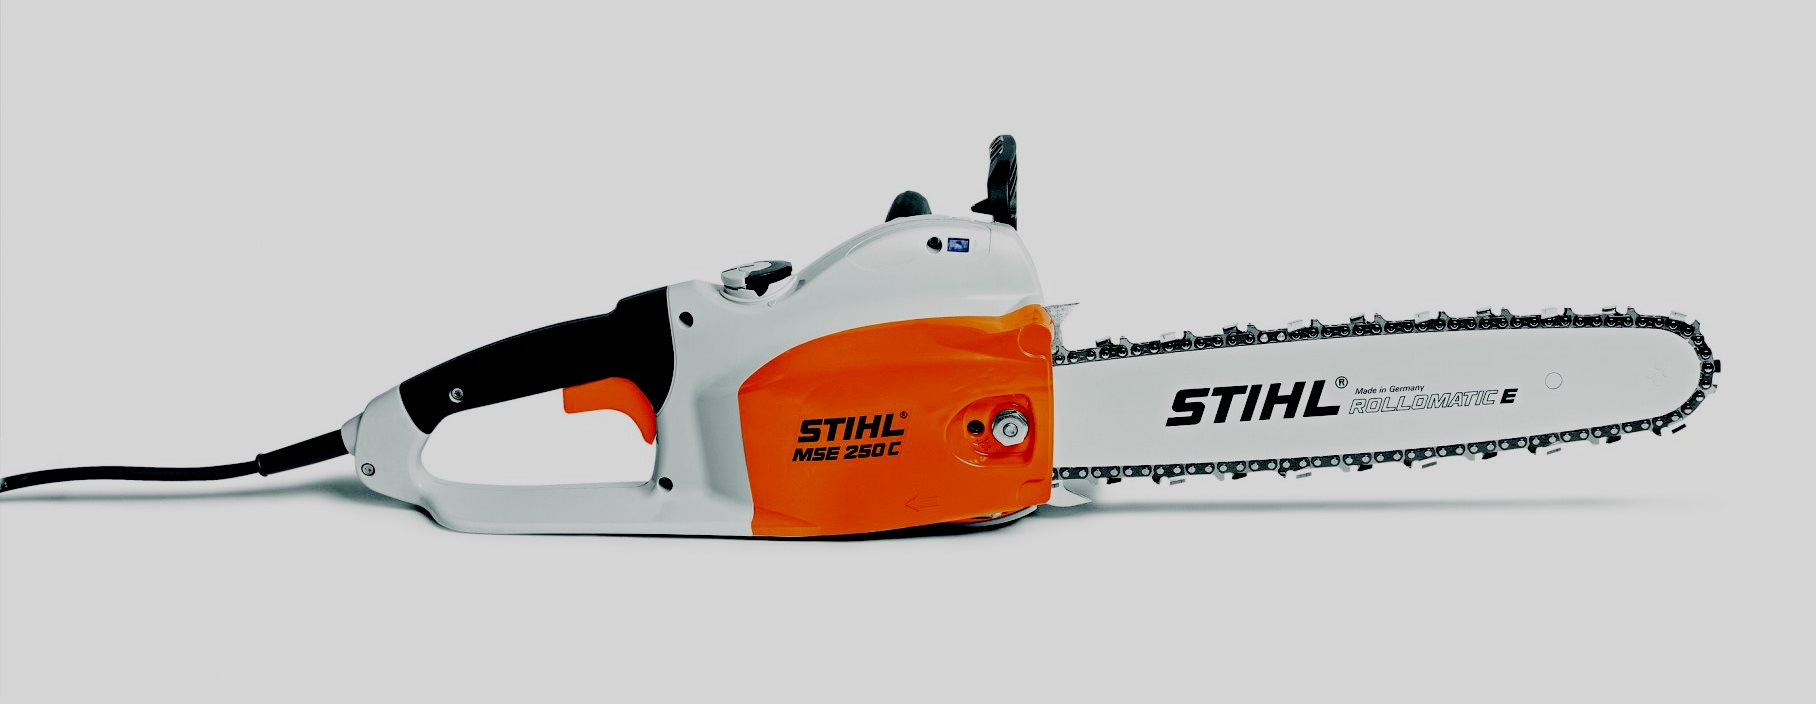 Stihl MSE 250 C-Q-16